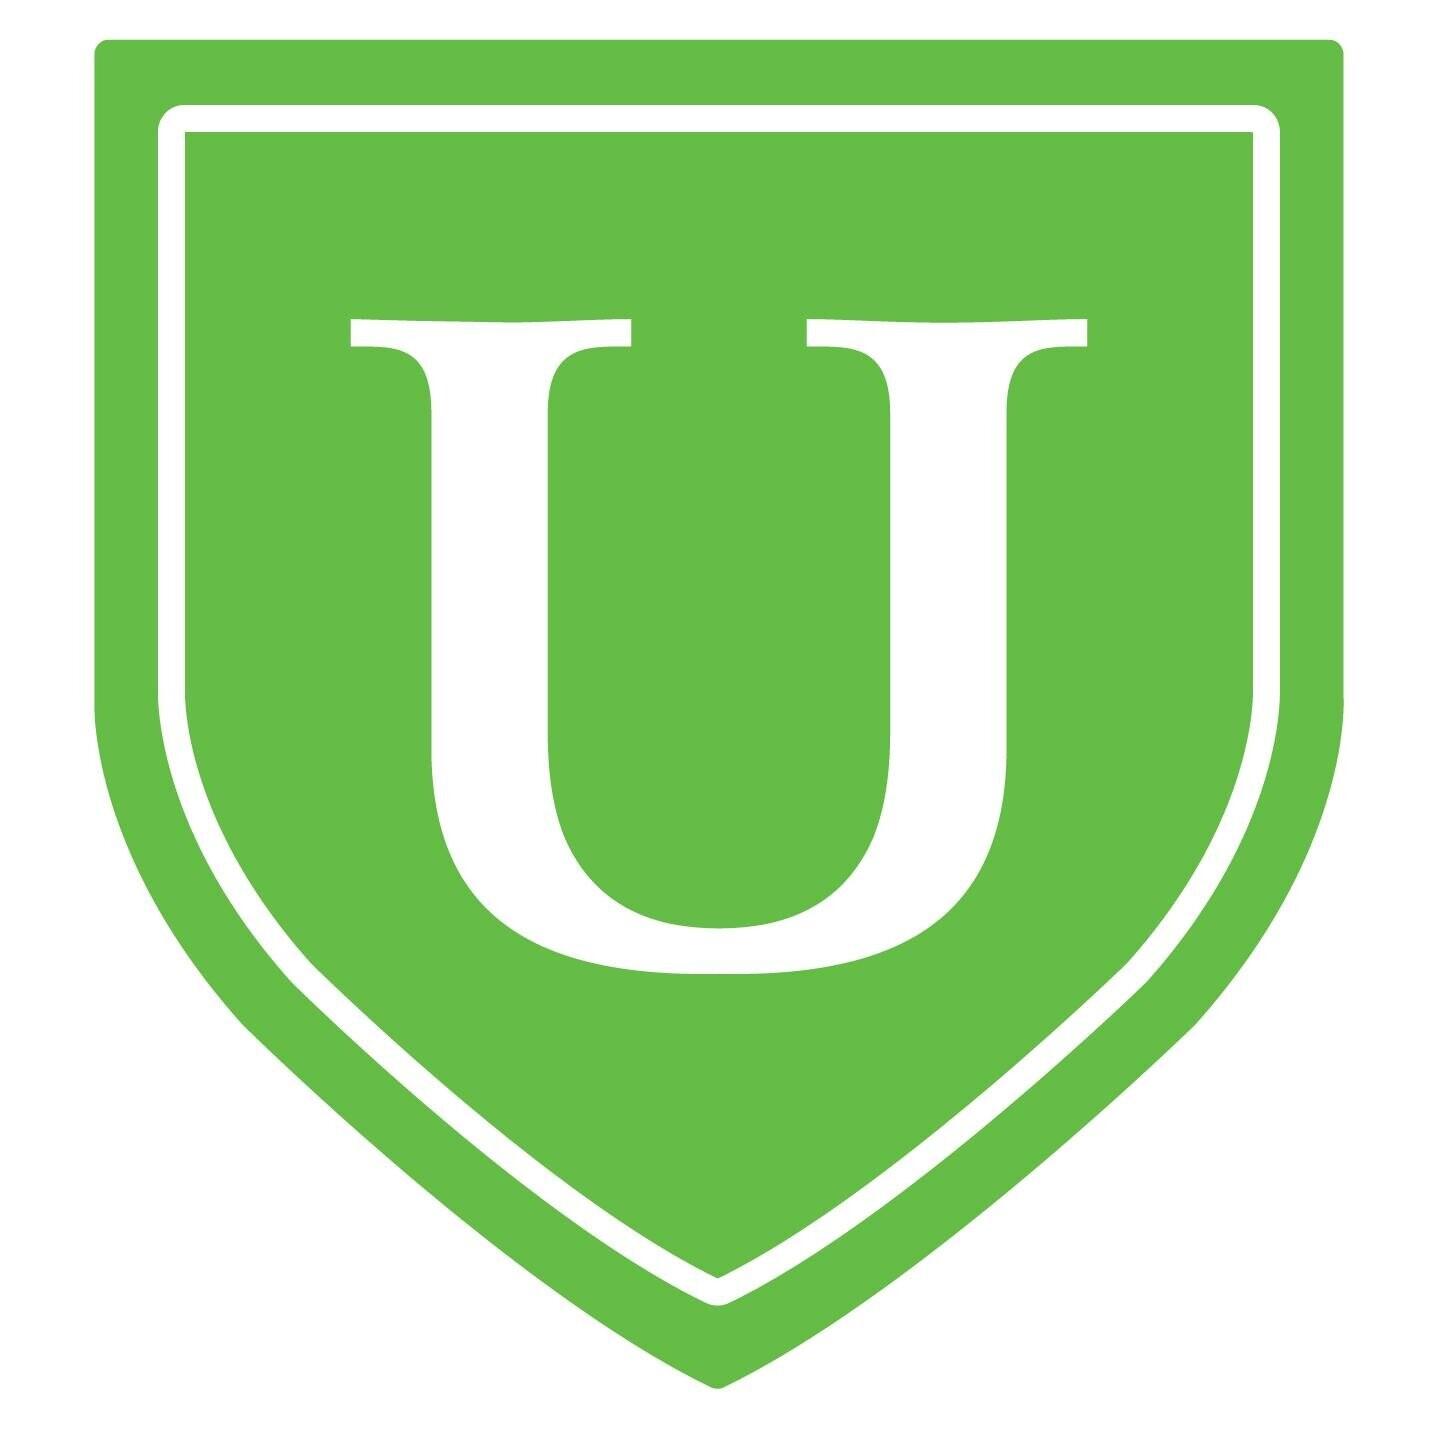 GreenerU